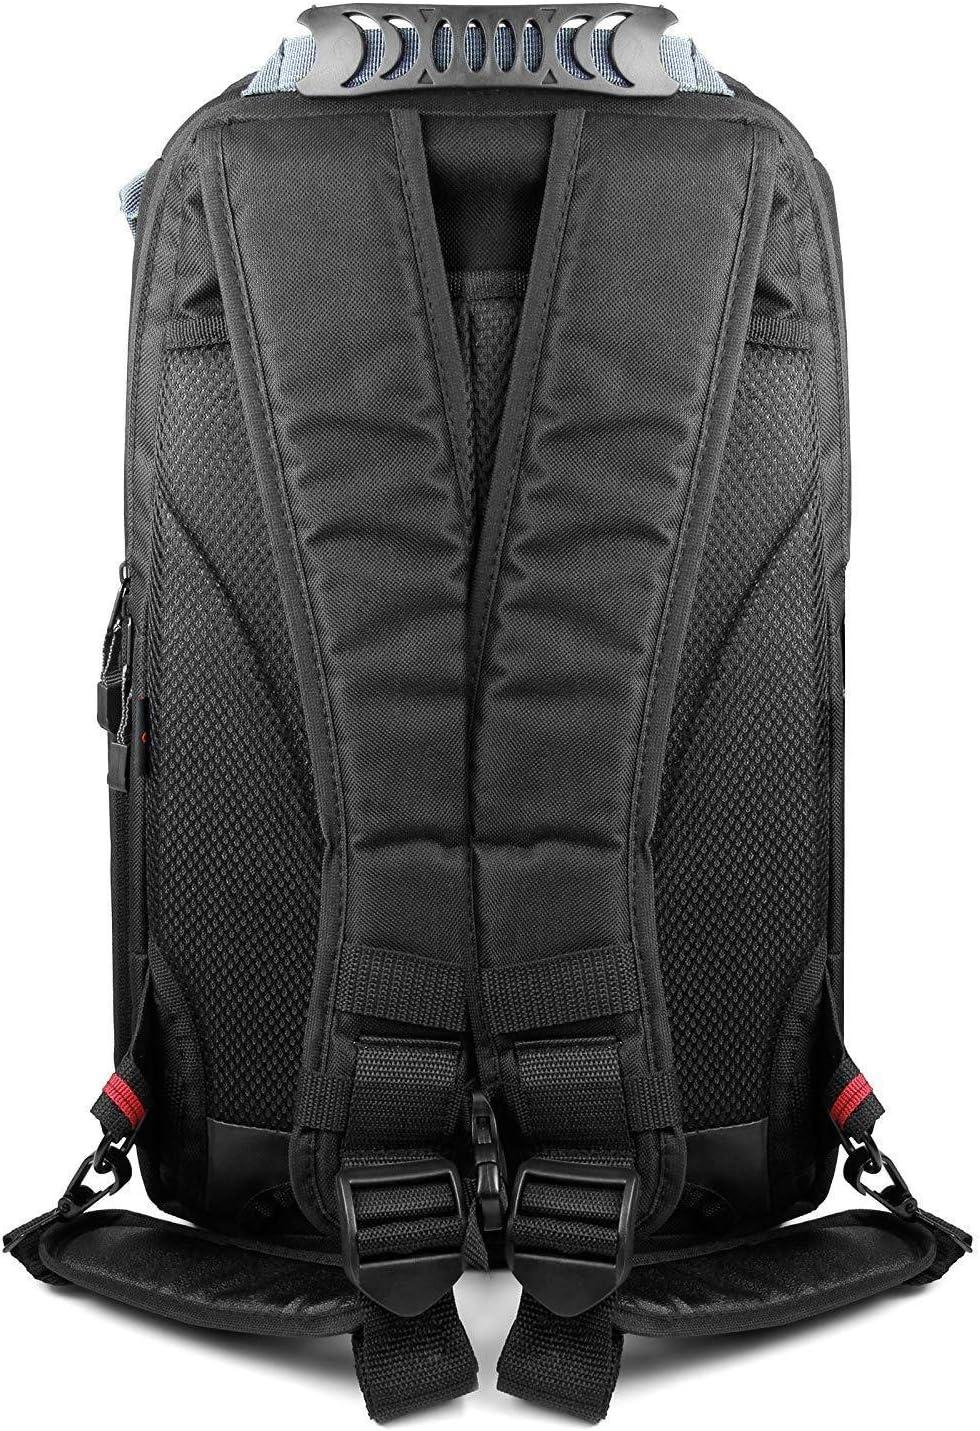 Compatible with Vivitar DVR908MFD Full HD Camcorder DURAGADGET Shock-Absorbing /& Water-Resistant Carry Bag in Black /& Orange